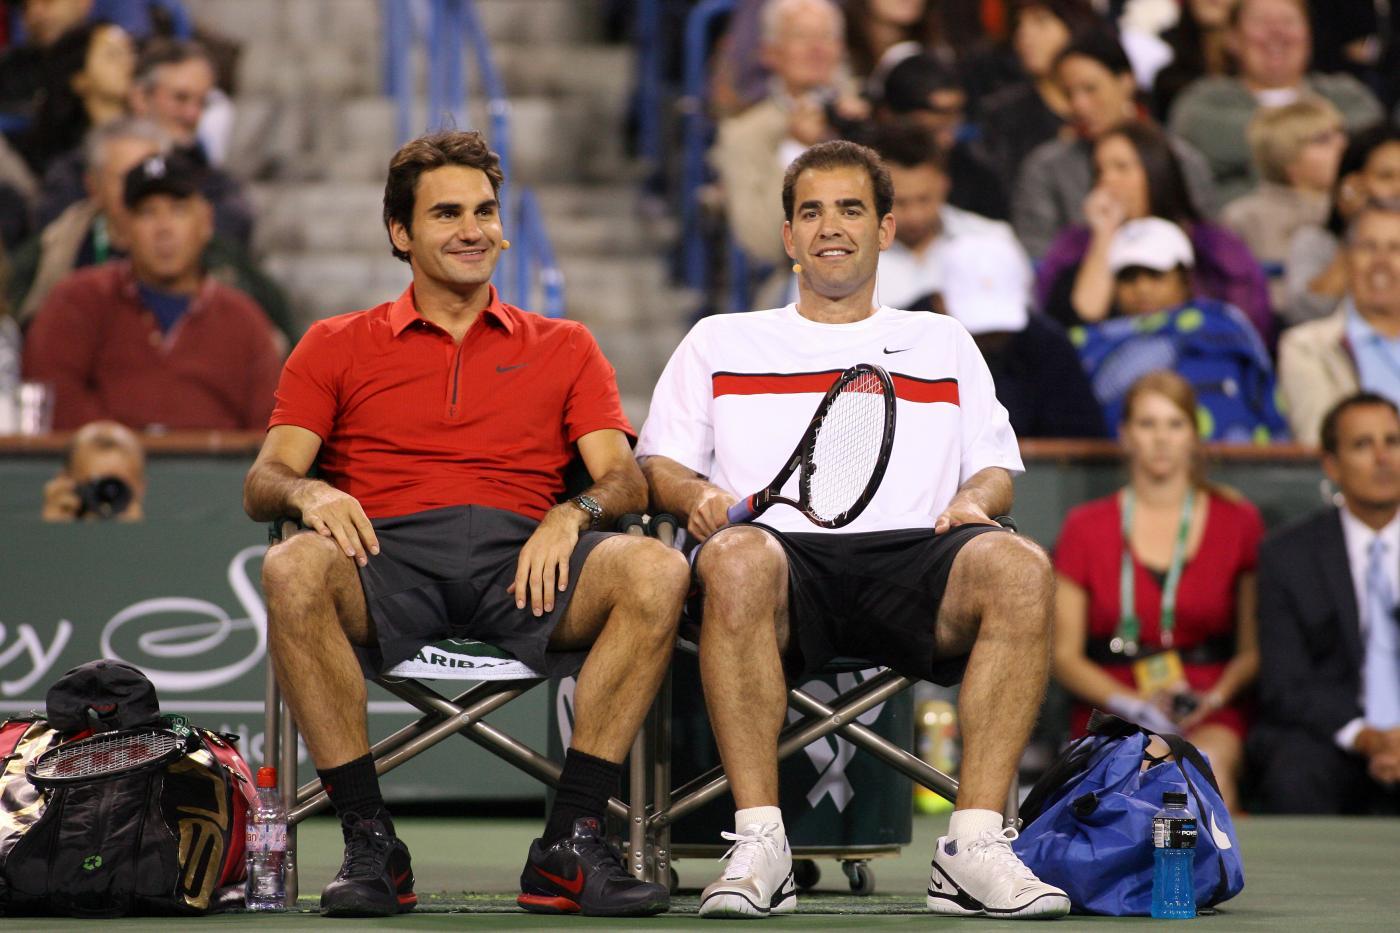 Federer Sampras